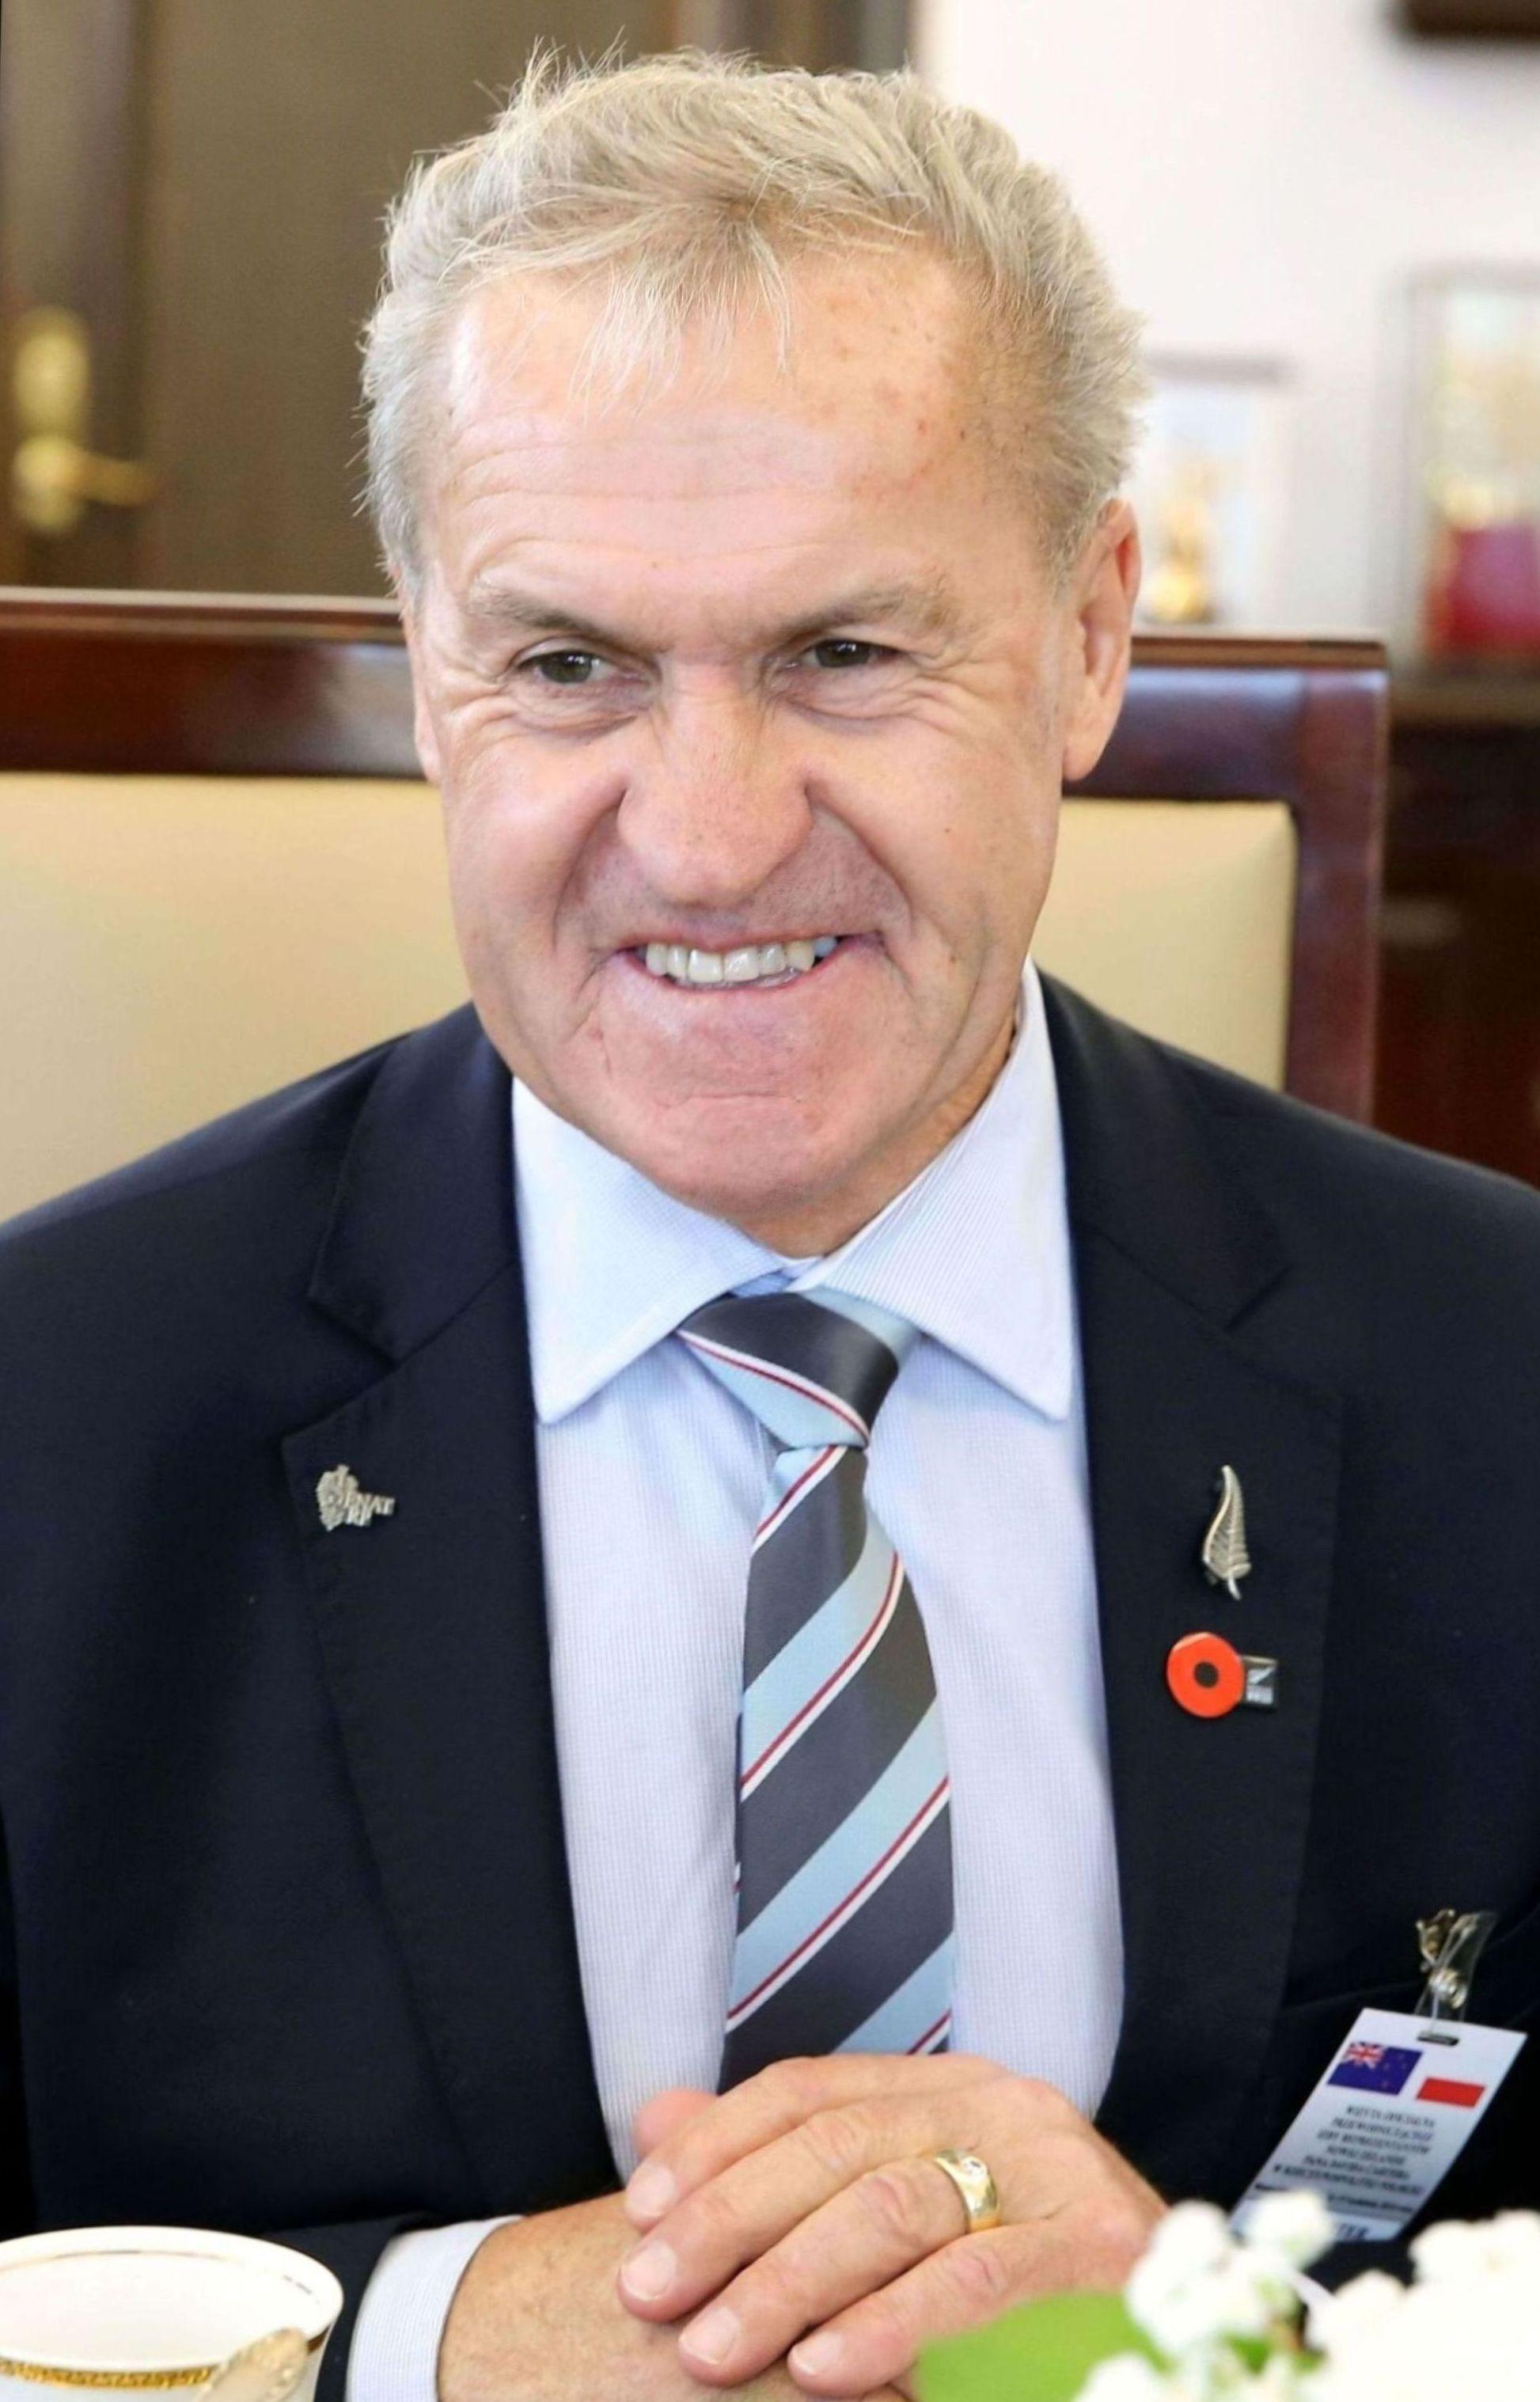 David Carter (politician) - Wikipedia